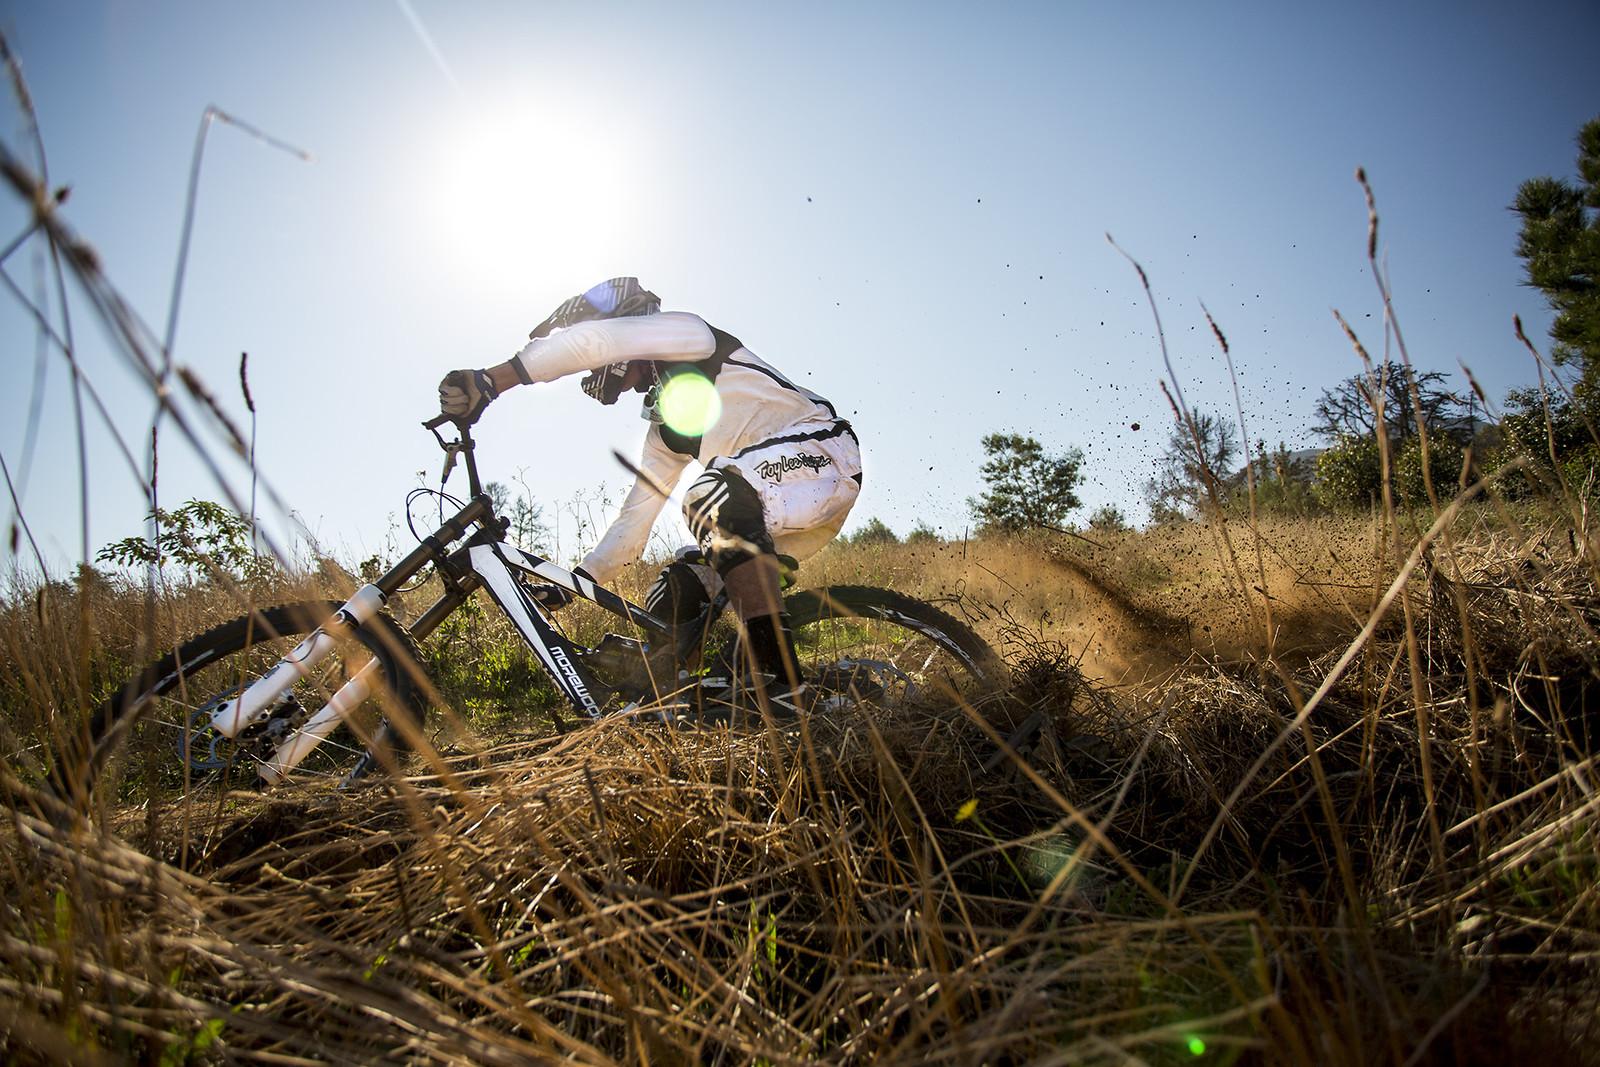 Adi vd Merwe (12) - Alexbsearle - Mountain Biking Pictures - Vital MTB